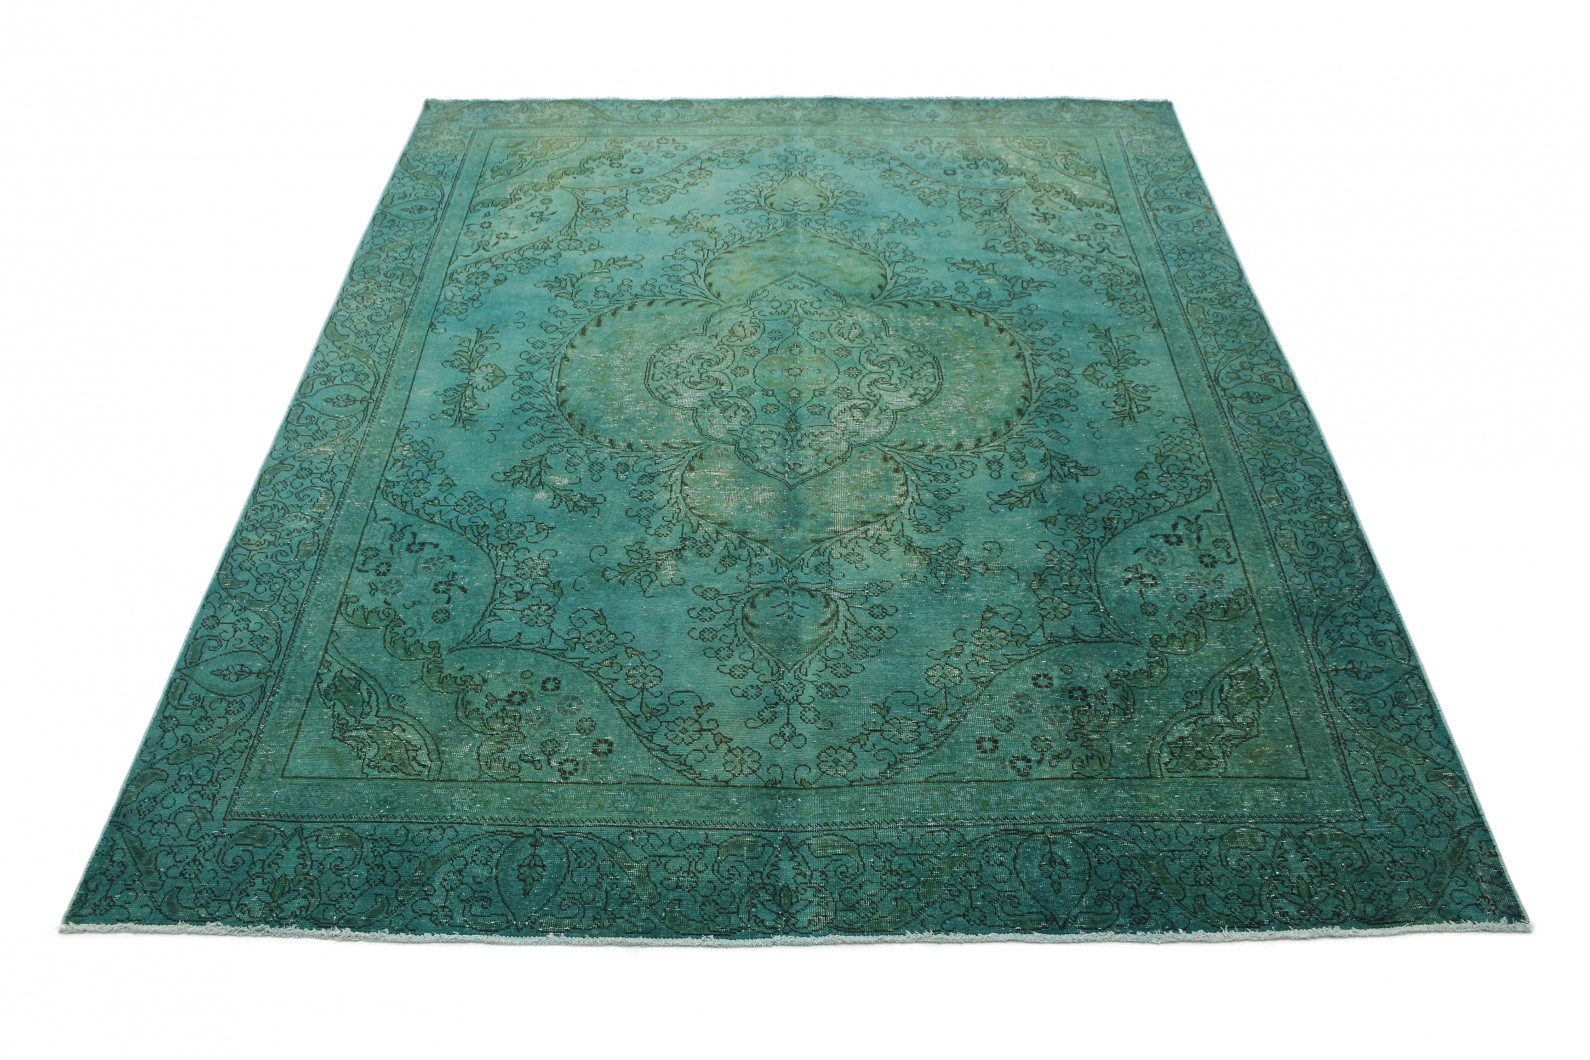 vintage teppich t rkis gr n in 360x280 1001 3695 bei kaufen. Black Bedroom Furniture Sets. Home Design Ideas